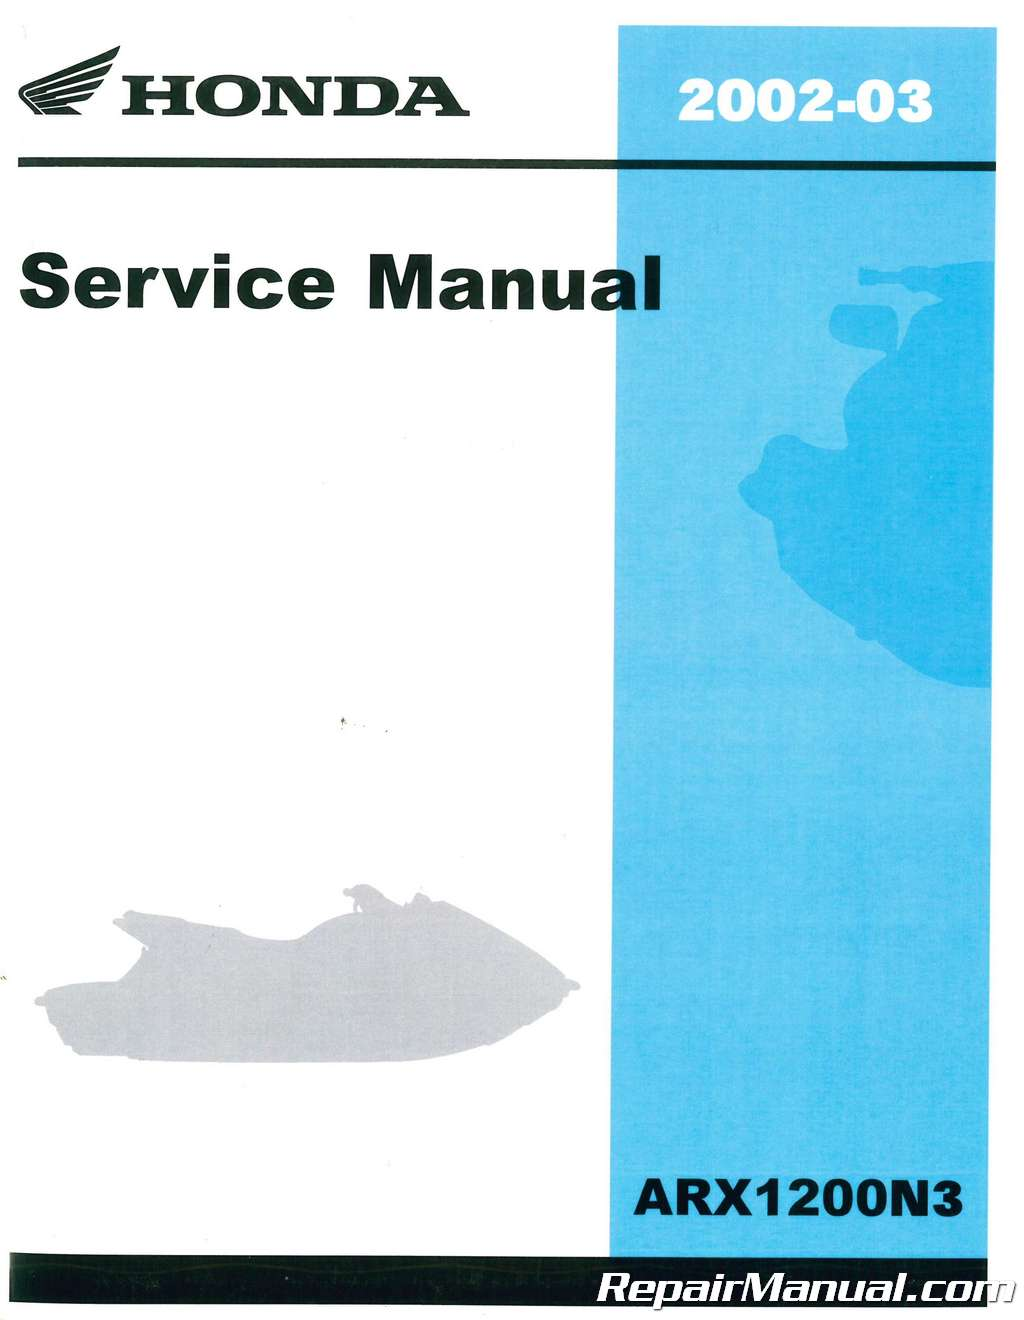 honda 2002 2003 arx 1200n3 t3 service manual rh repairmanual com 2006 Aquatrax 2012 Honda Aquatrax